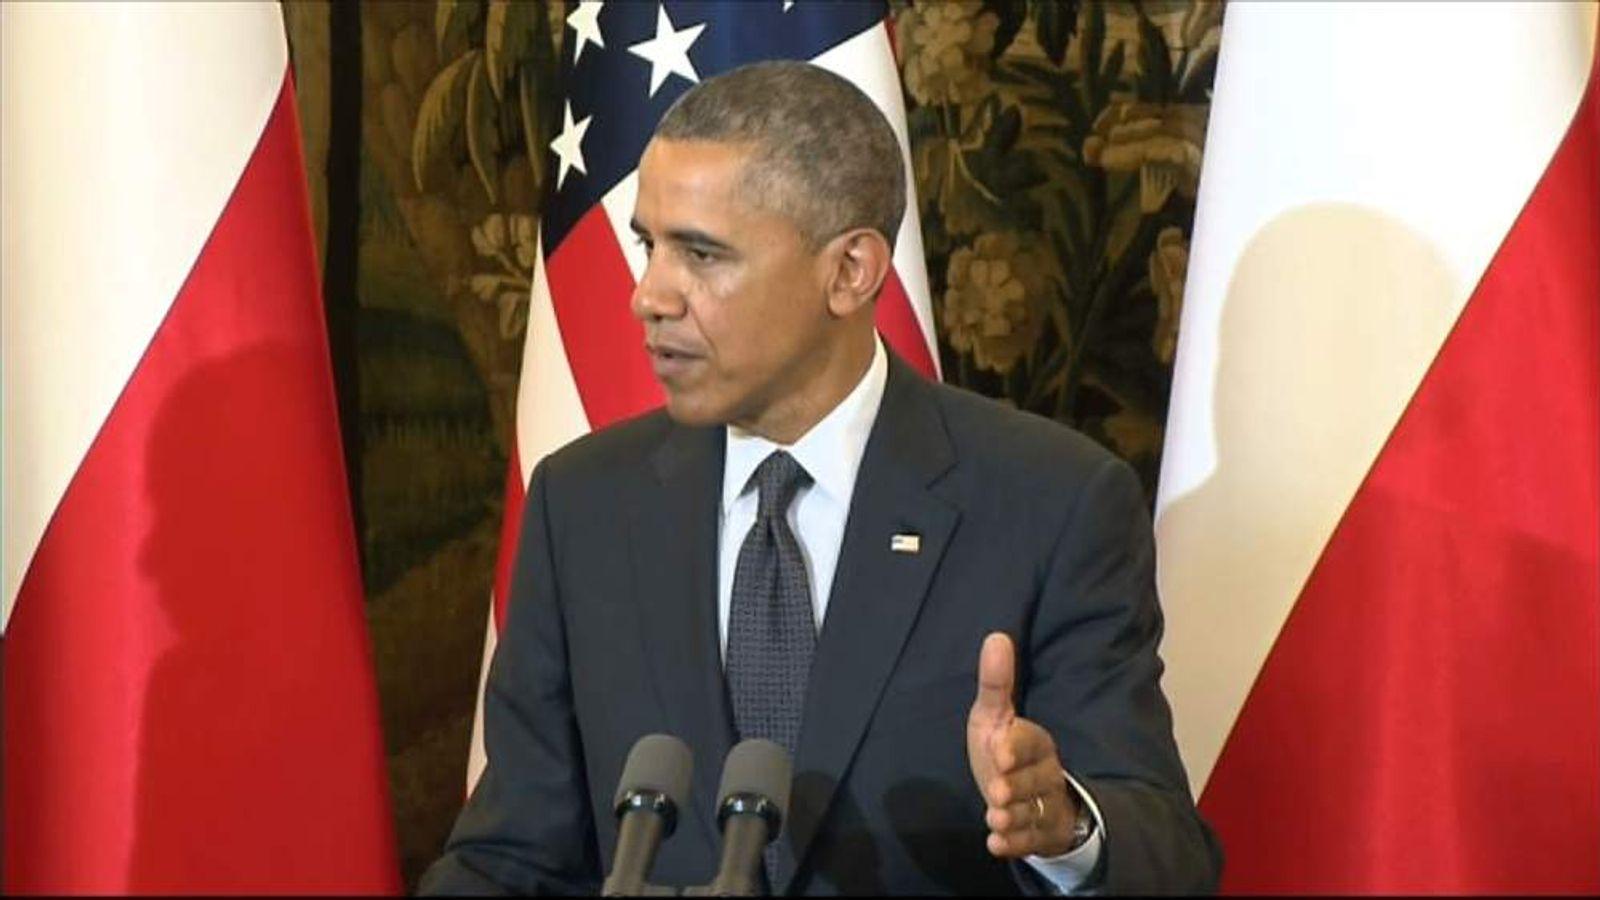 Obama Press Conference In Poland